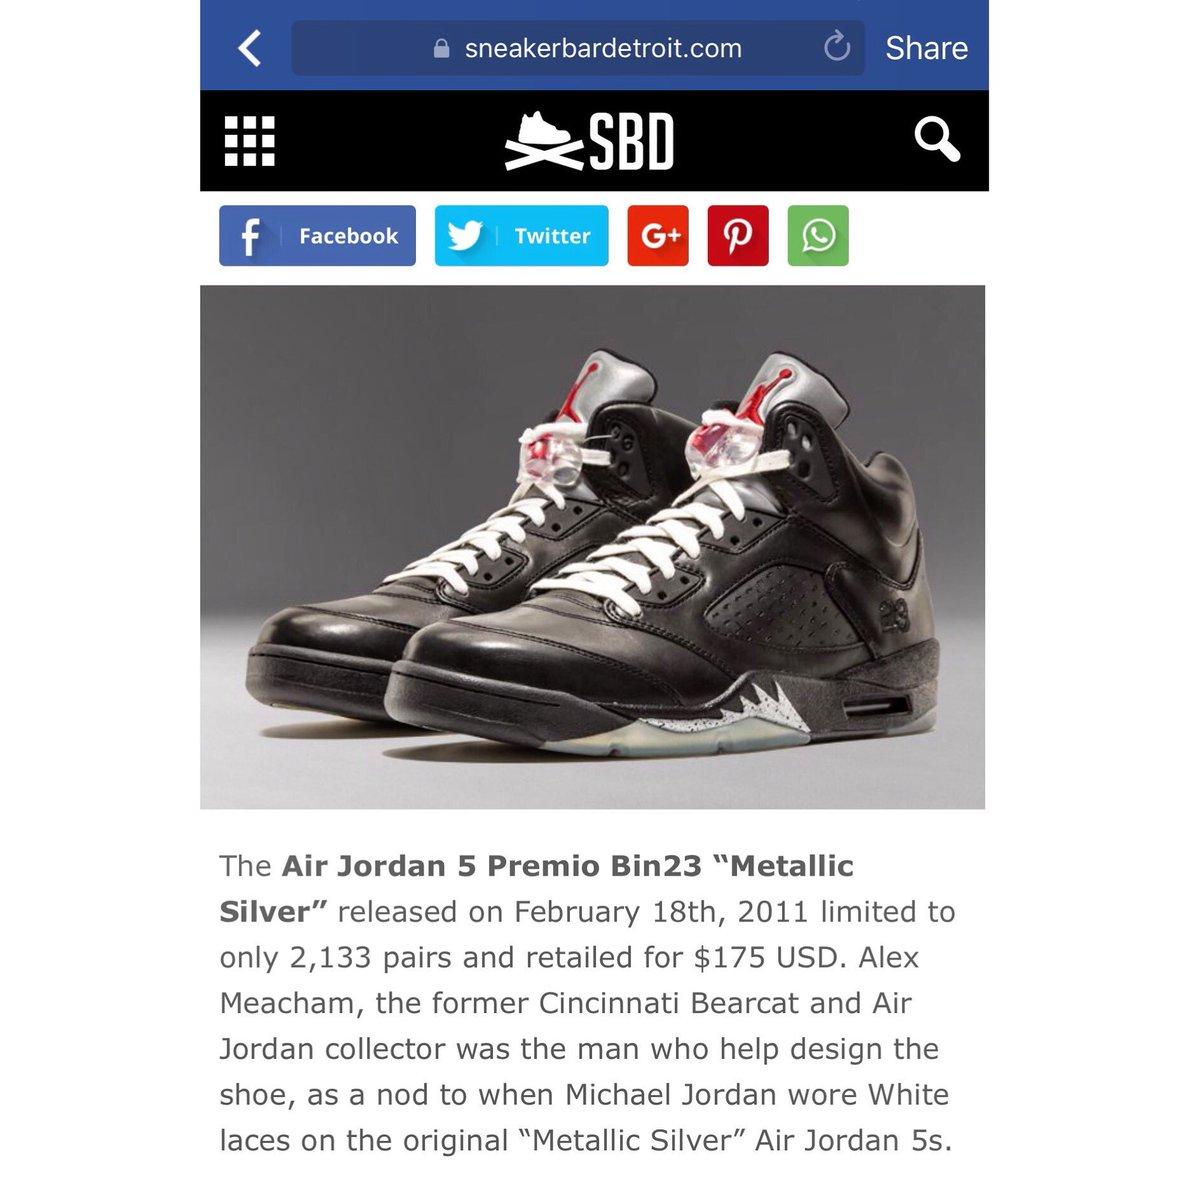 Air Jordan 5 Premio Bin23 Metallic